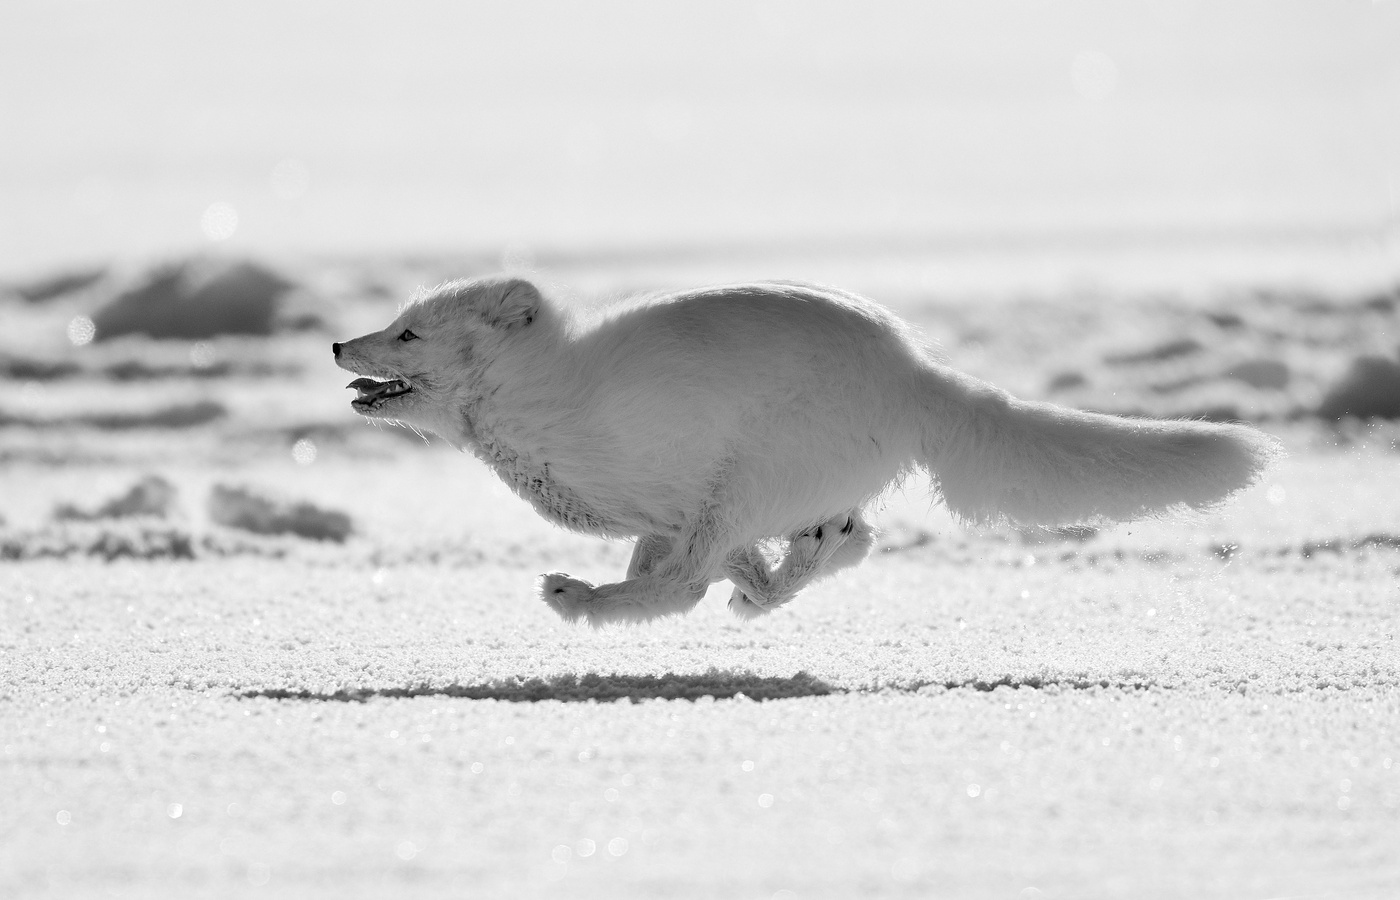 arctic-fox-running-y7.jpg